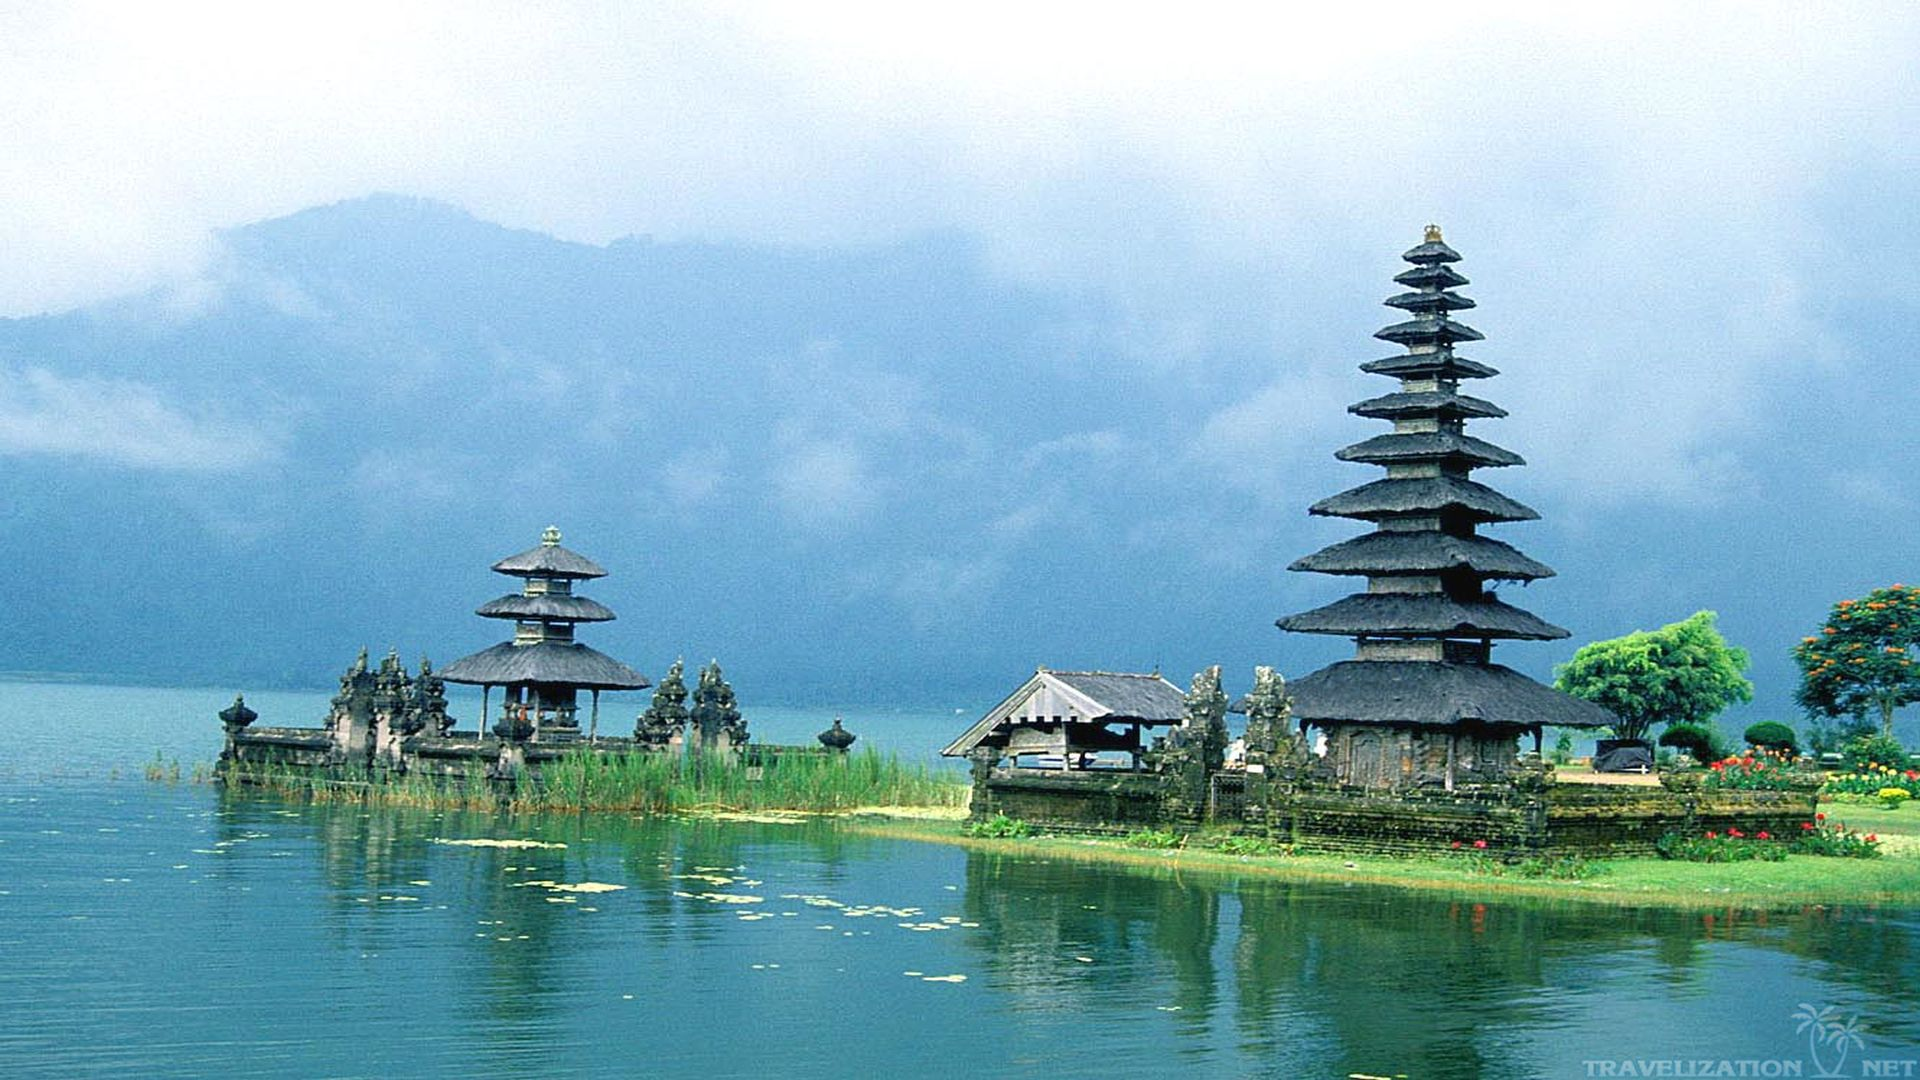 ... 2560×1920. Dusun Villa Bali Wallpapers